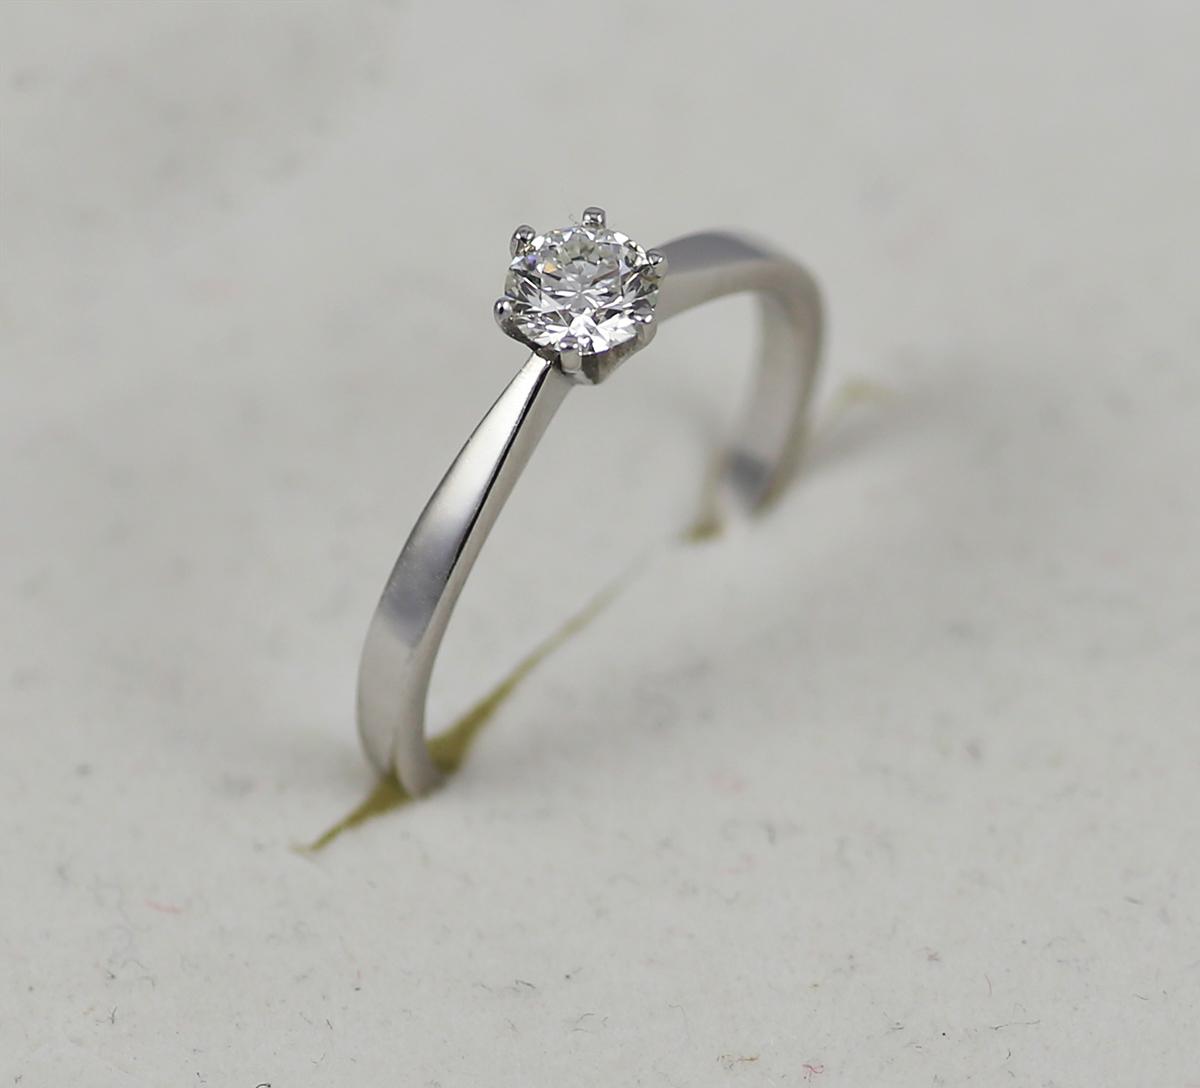 Zlaty Zasnubni Prsten S Diamantem